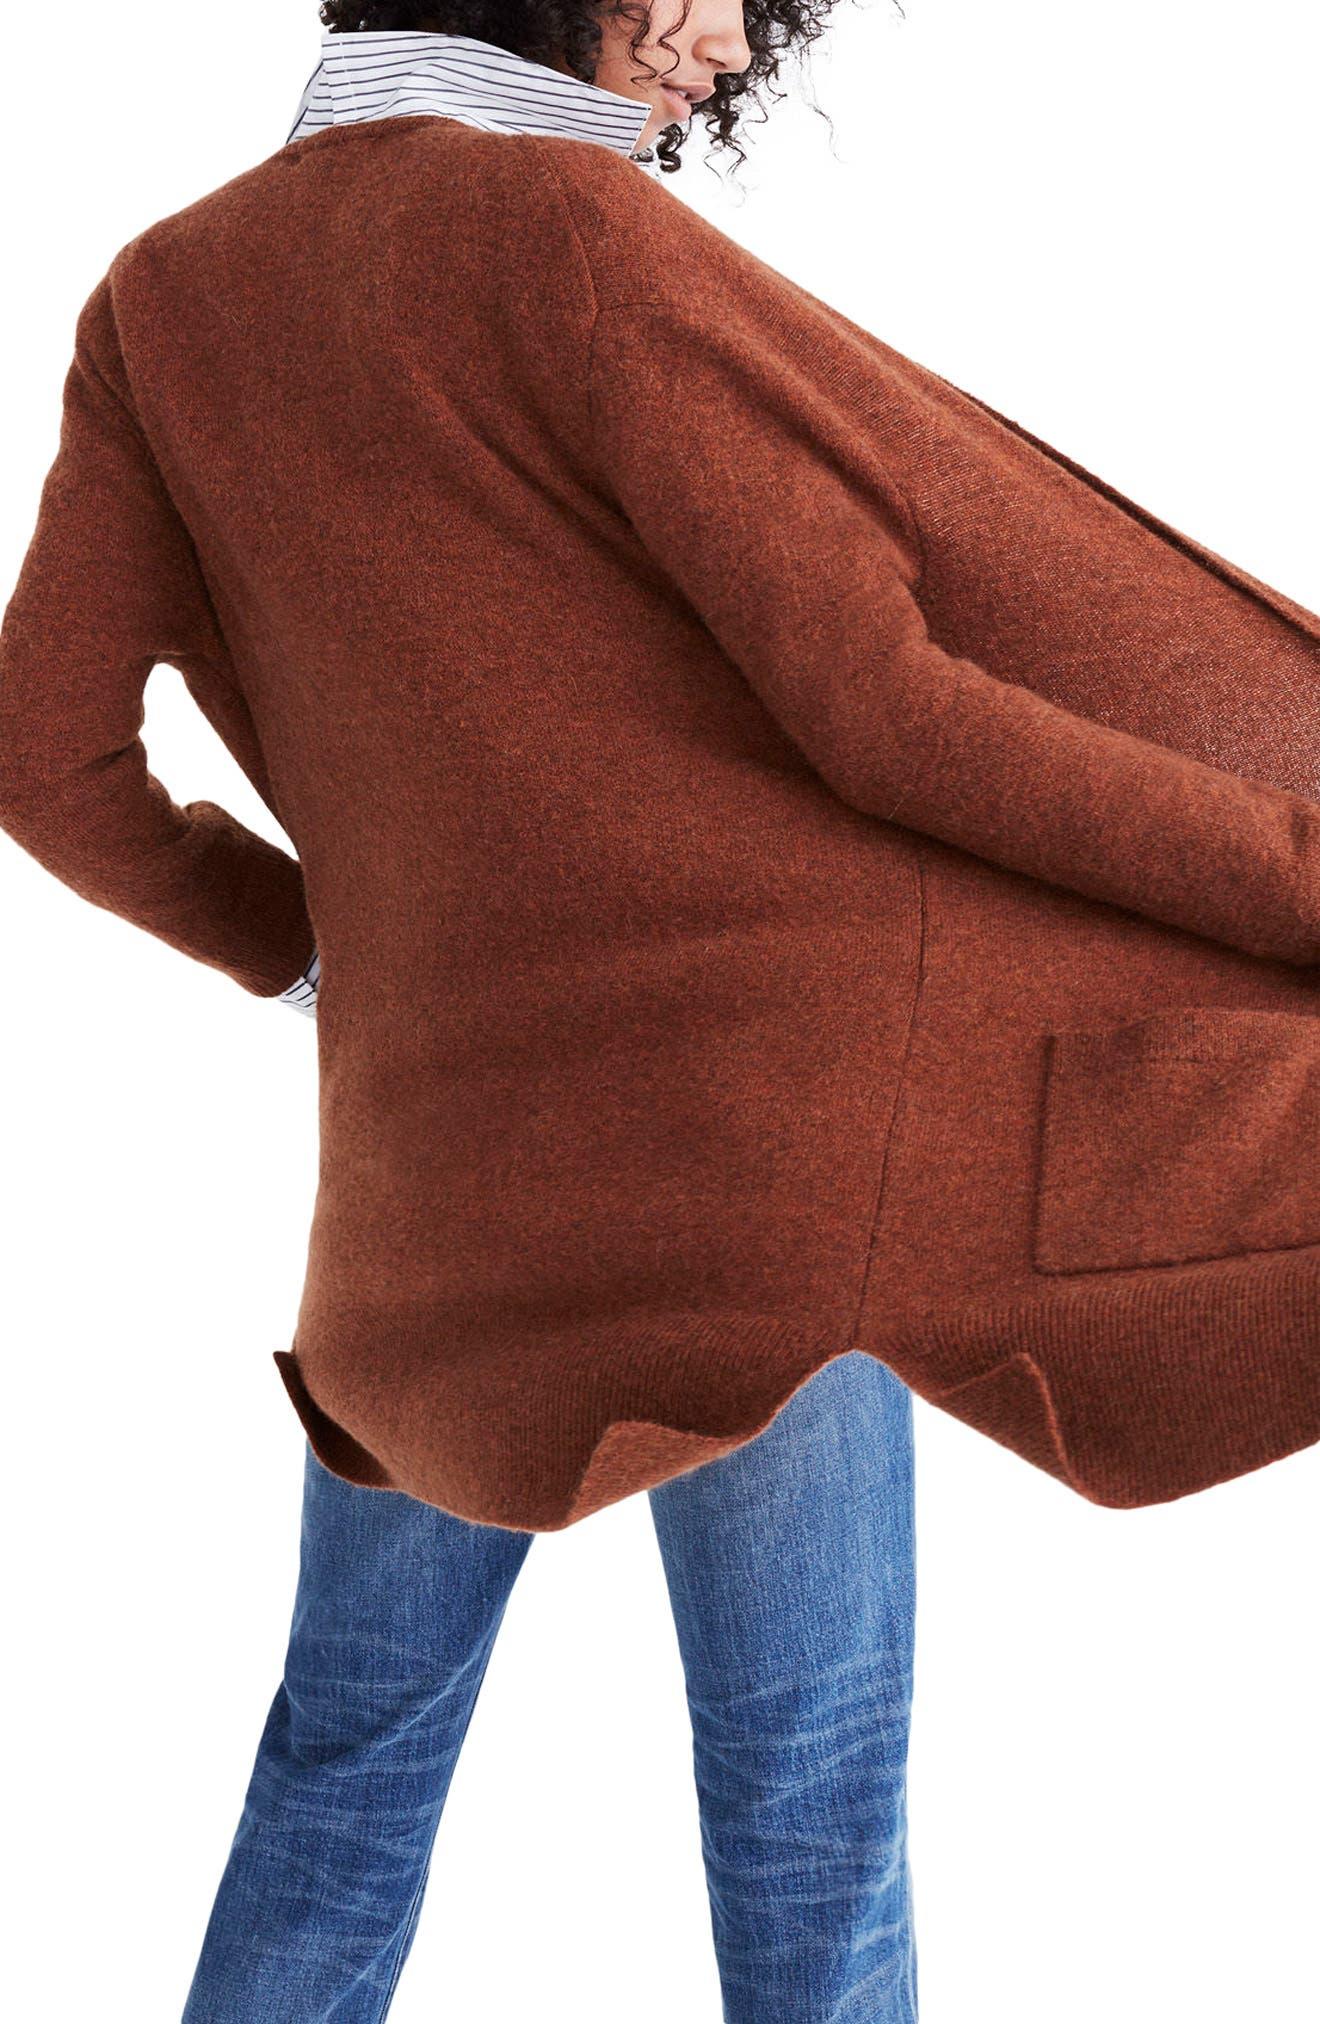 Kent Cardigan Sweater,                             Alternate thumbnail 26, color,